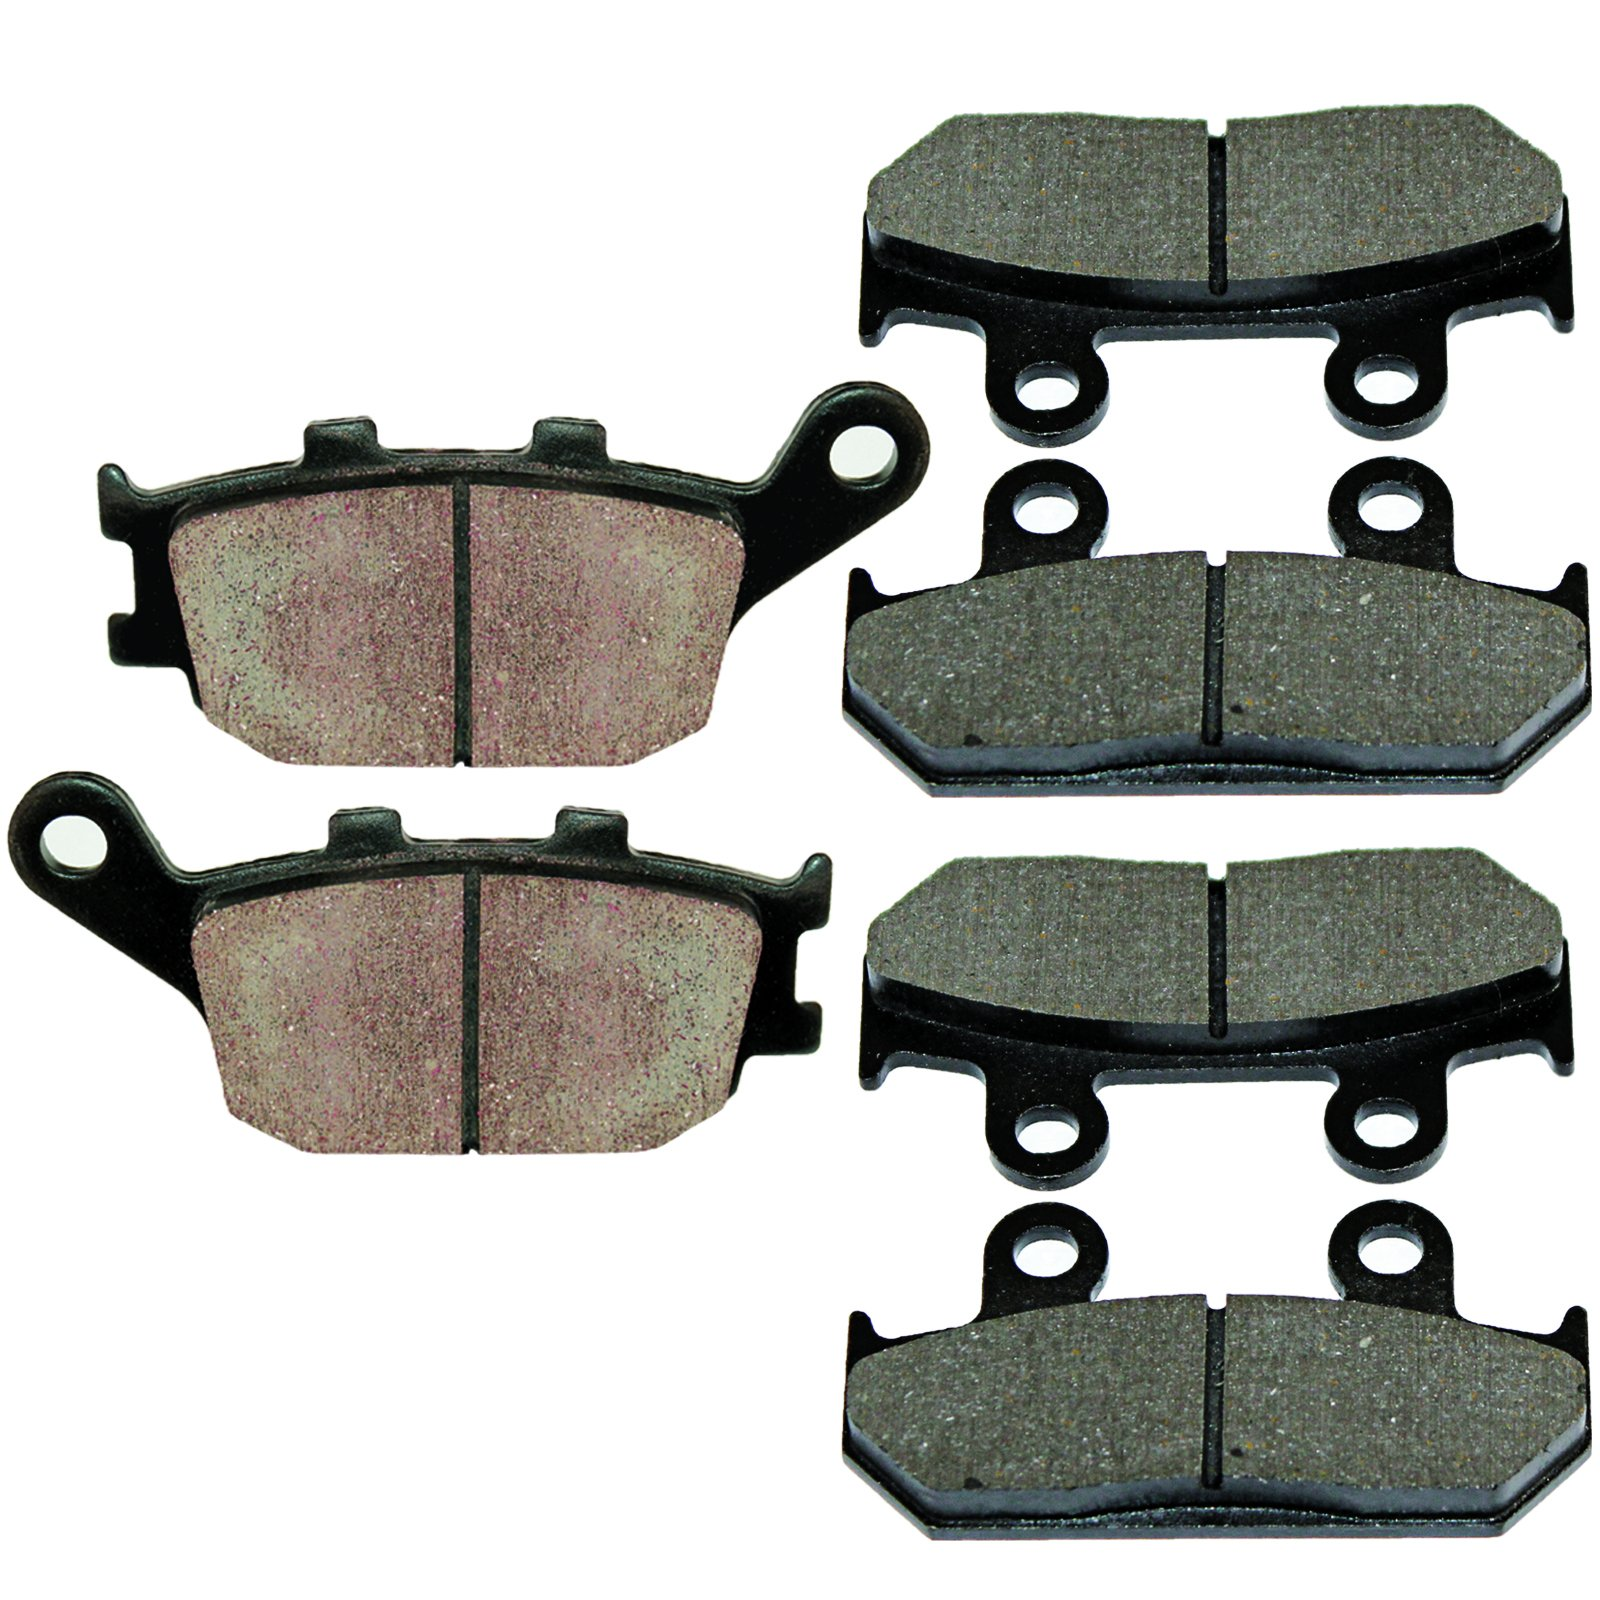 Caltric FRONT & REAR BRAKE PADS Fits HONDA CBR600 CBR-600 CBR600F CBR600F2 SUPER SPORT 1991-1994